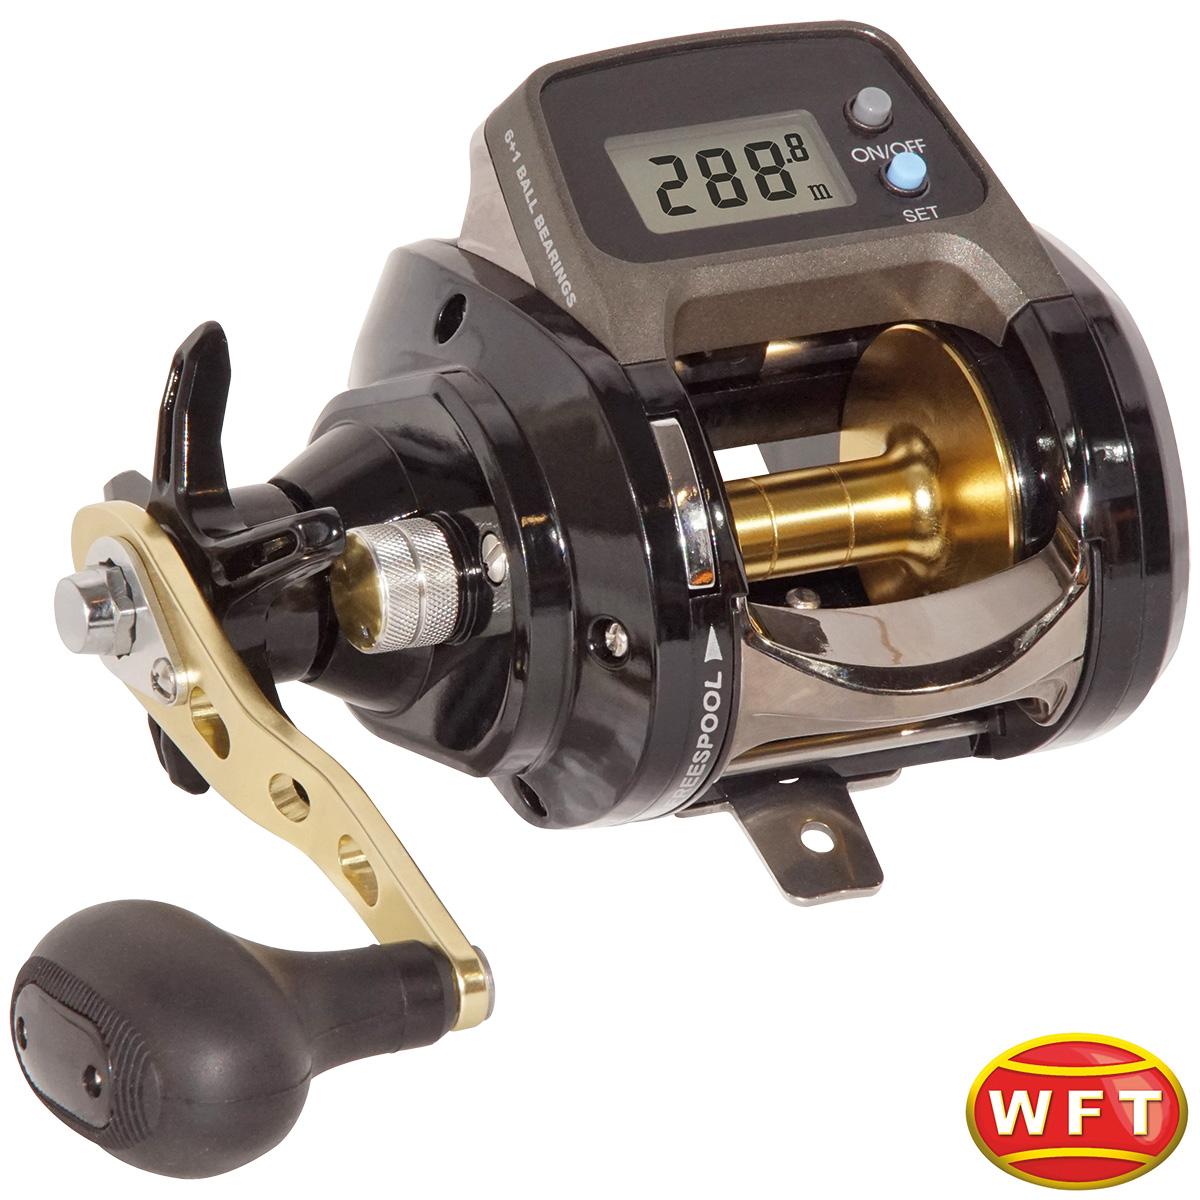 WFT 865 Digital Linecounter LH oder RH